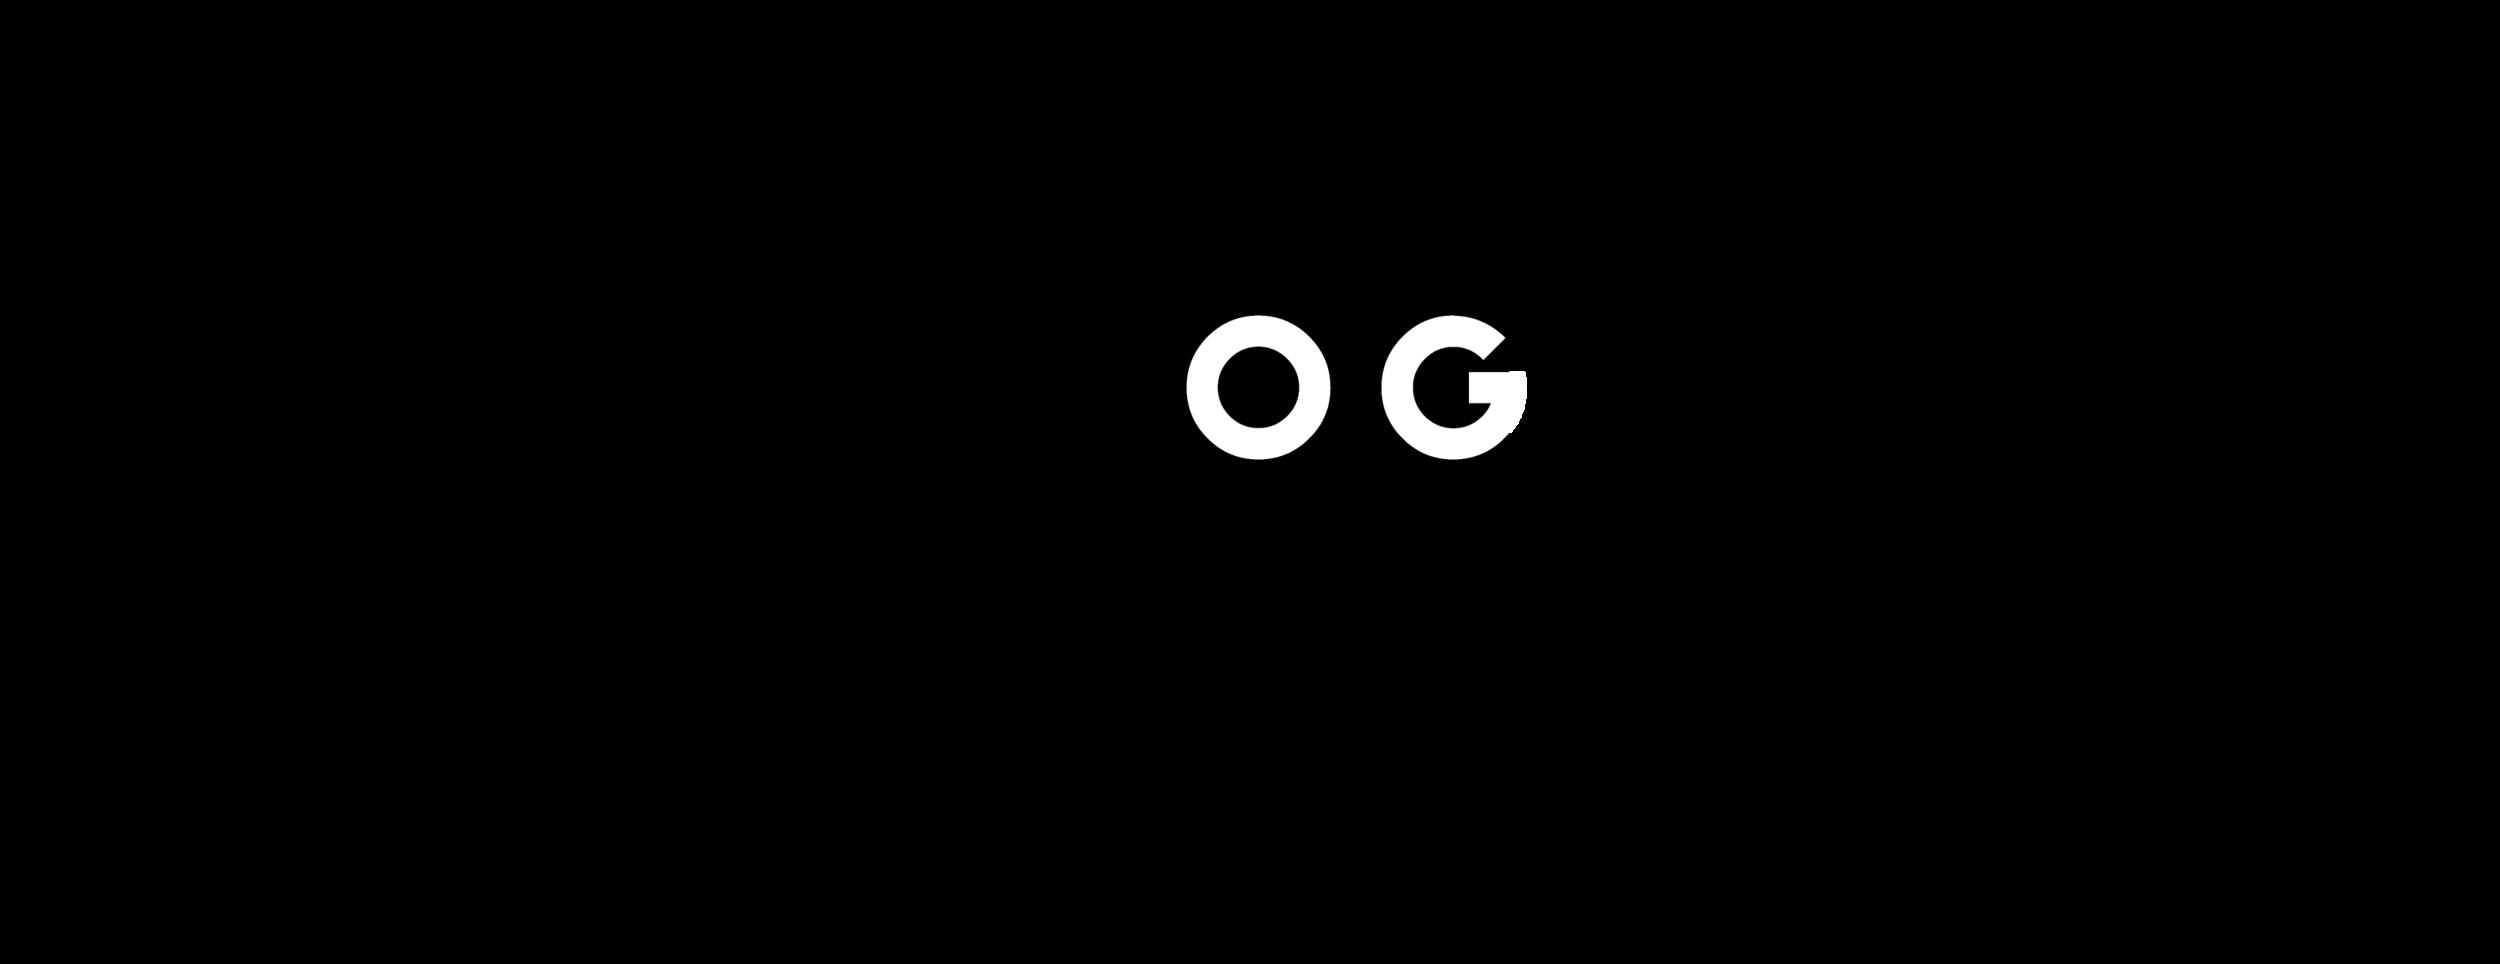 logo_vgmakers_bw_web.png